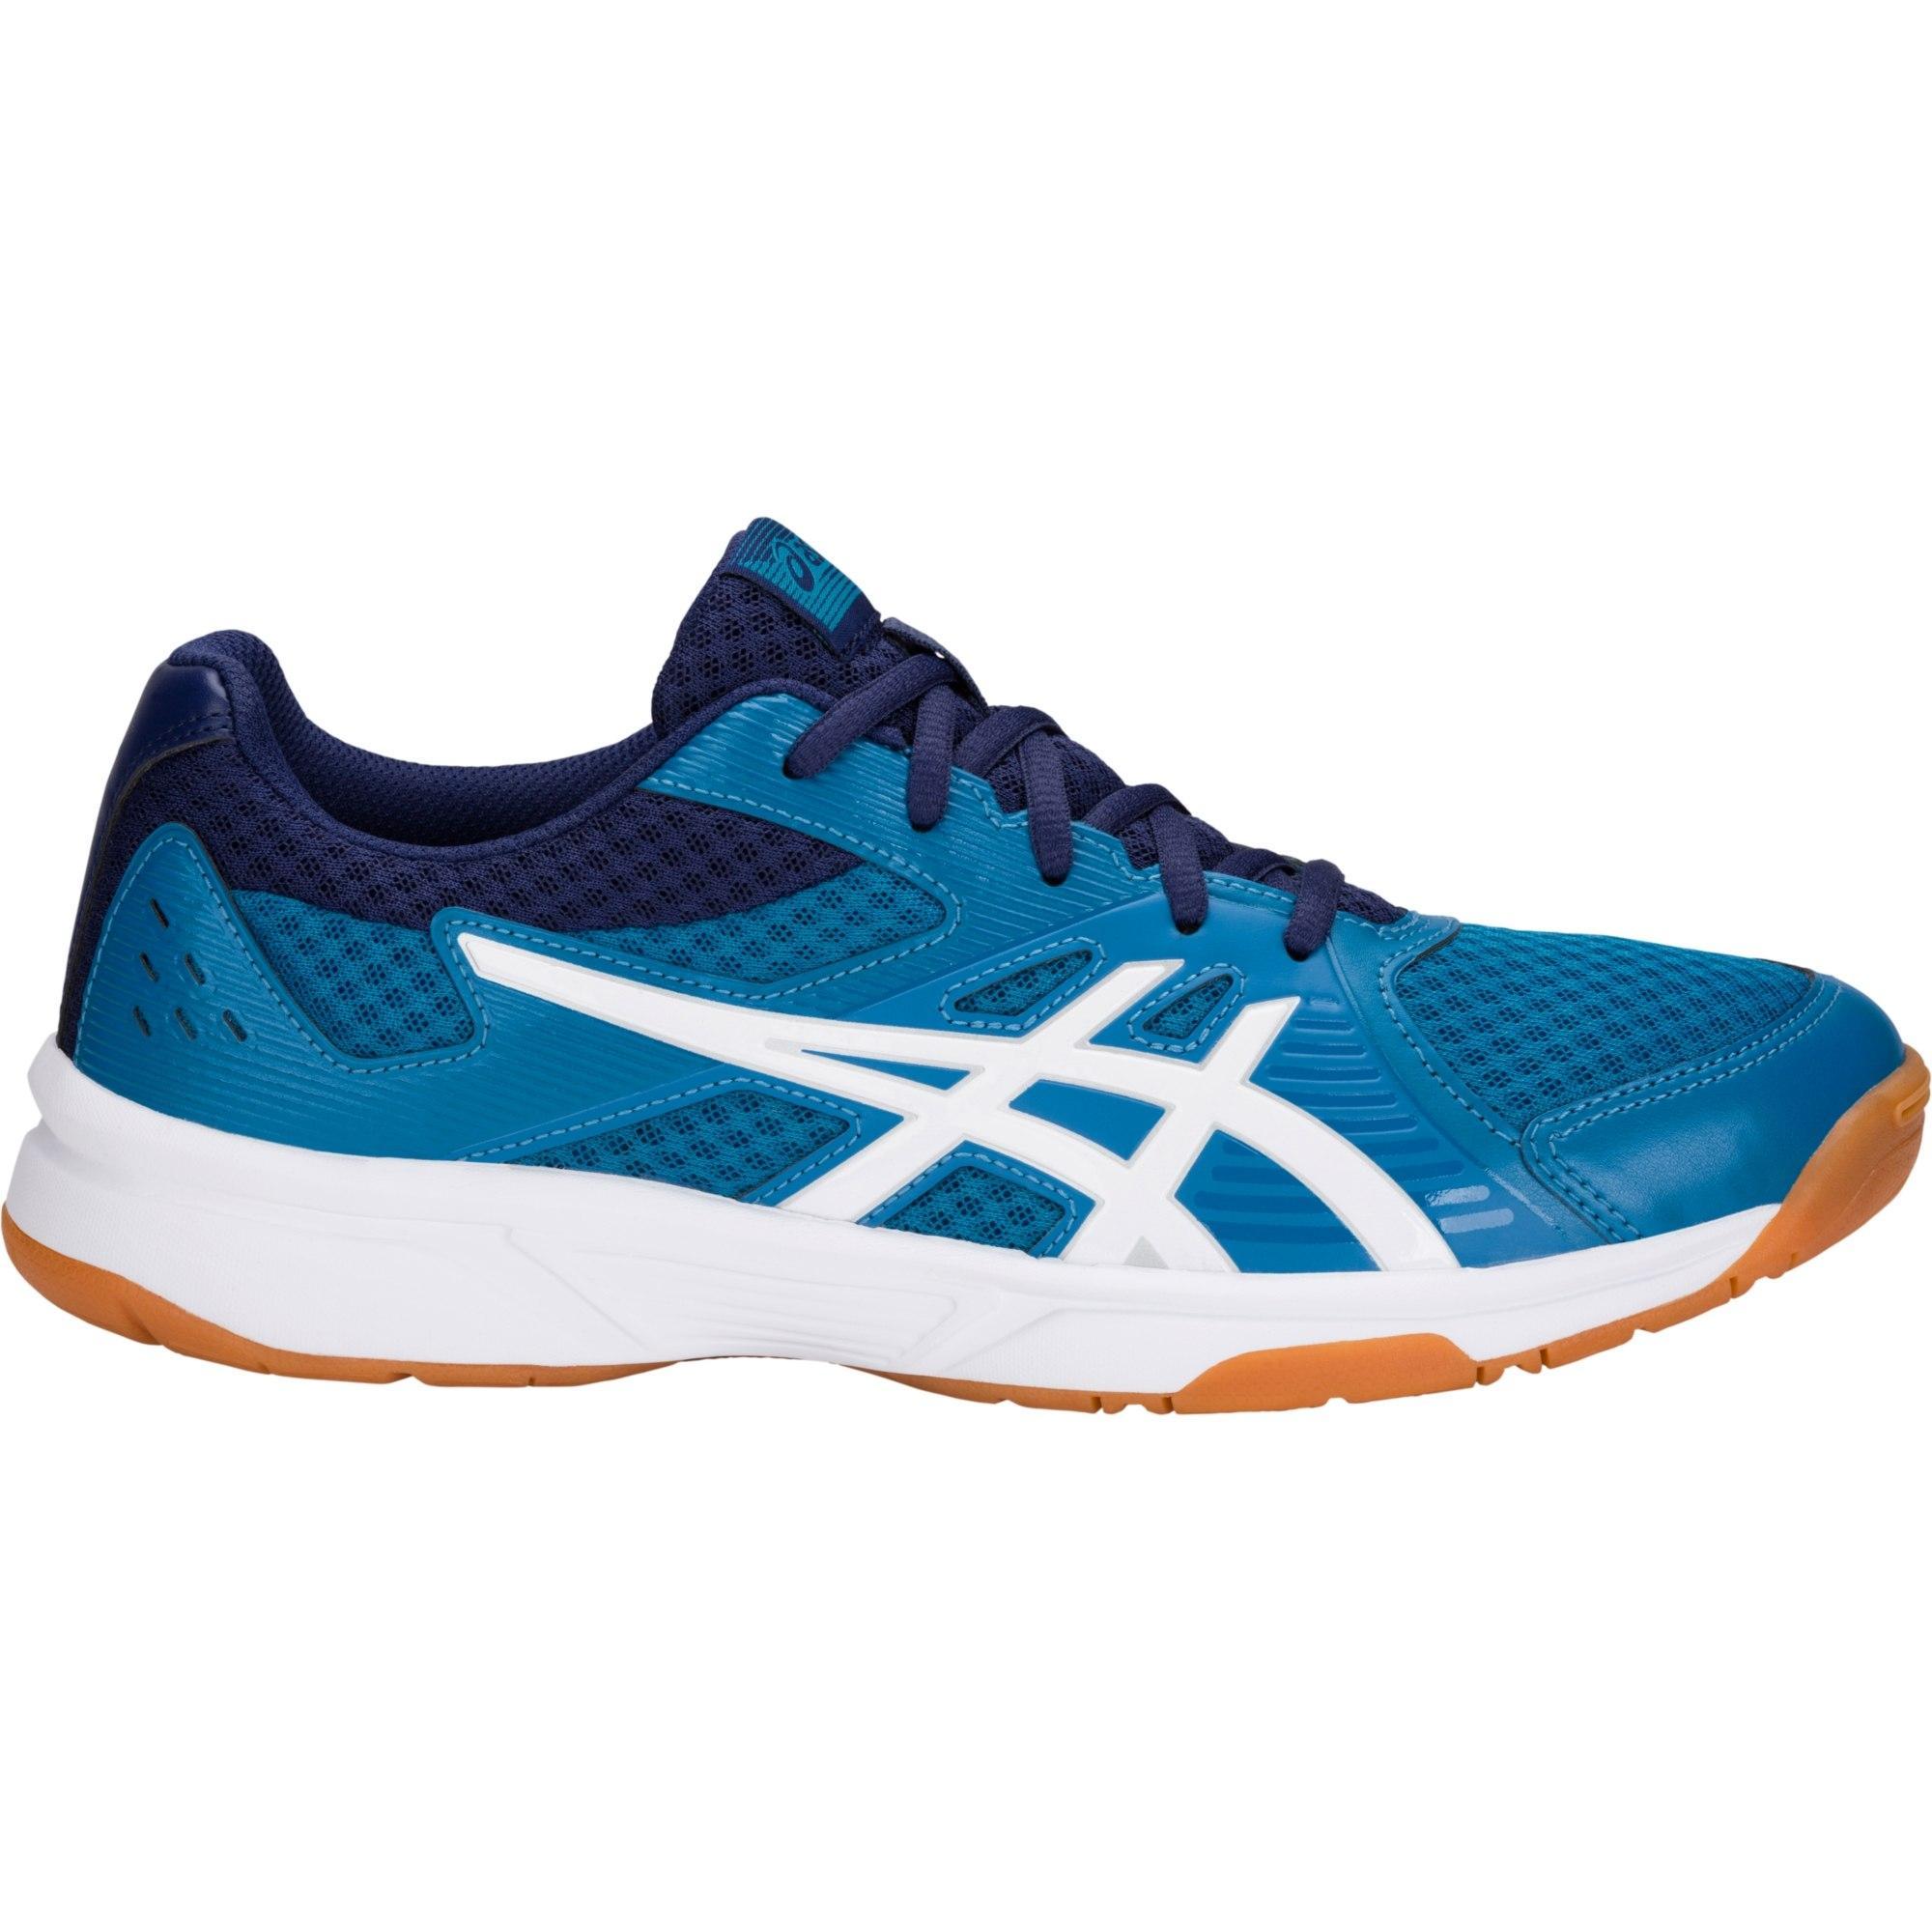 1f0f762b0 Asics Mens GEL-Upcourt 3 Indoor Court Shoes - Race Blue/White -  Tennisnuts.com